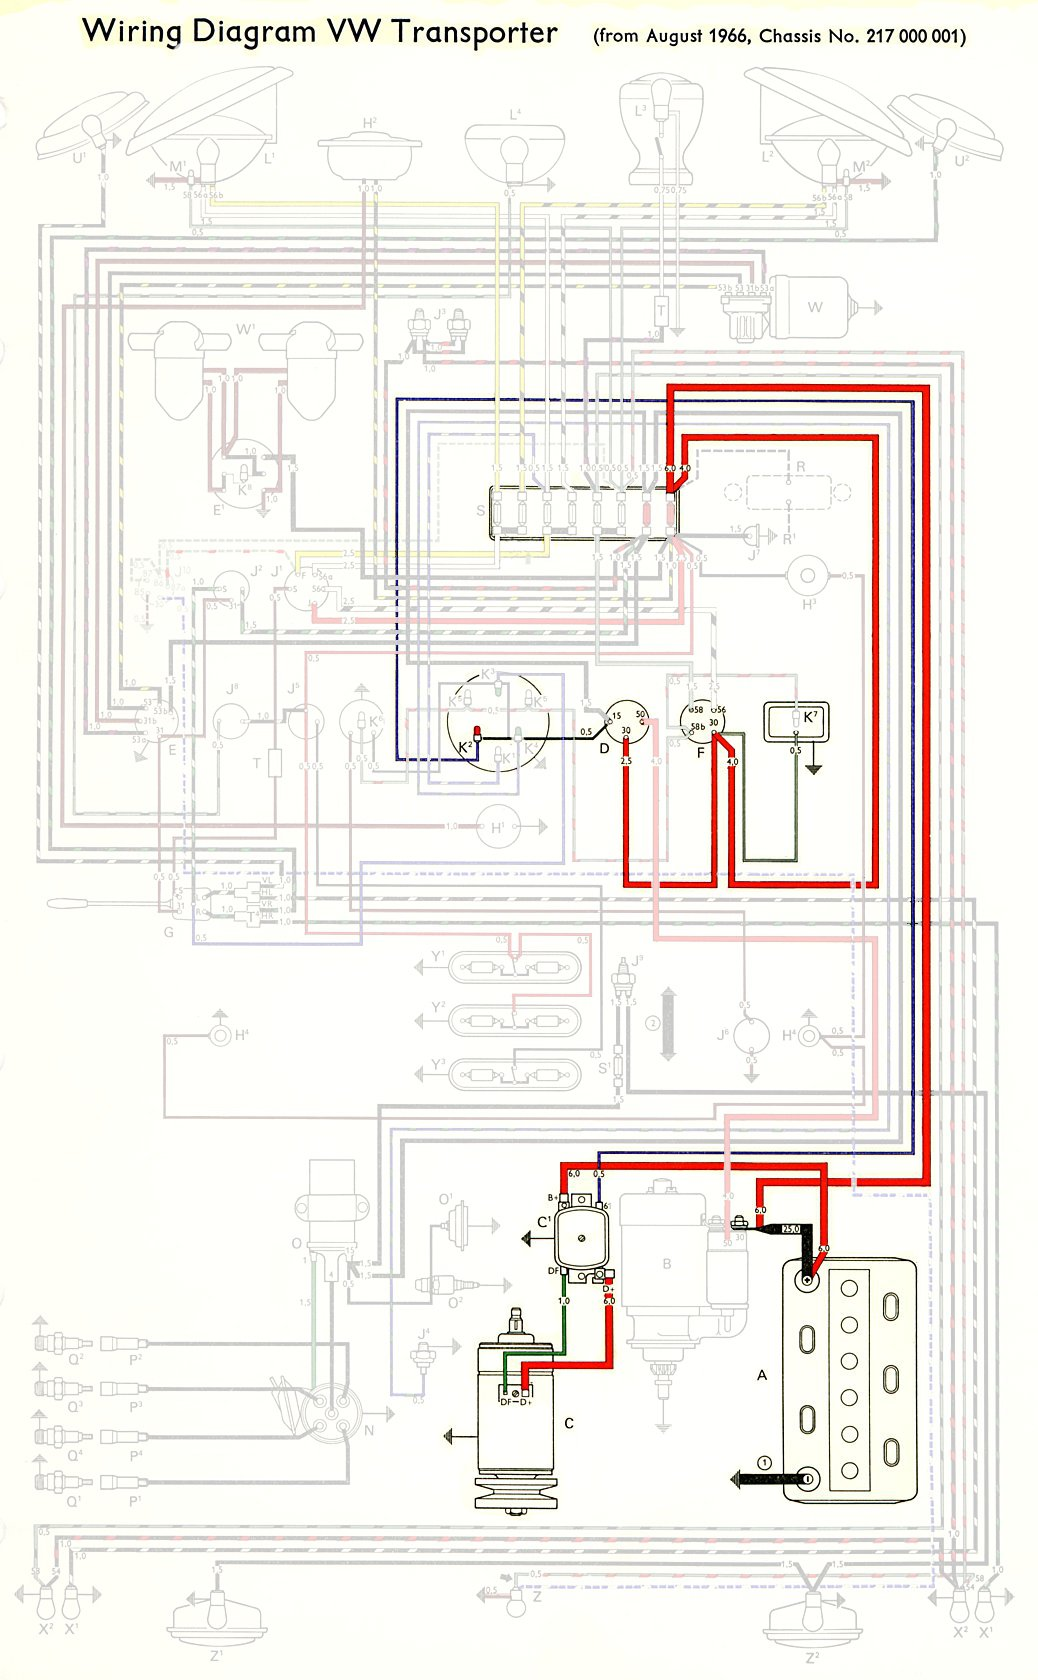 1970 vw type 2 wiring diagram 1991 4l80e thesamba diagrams